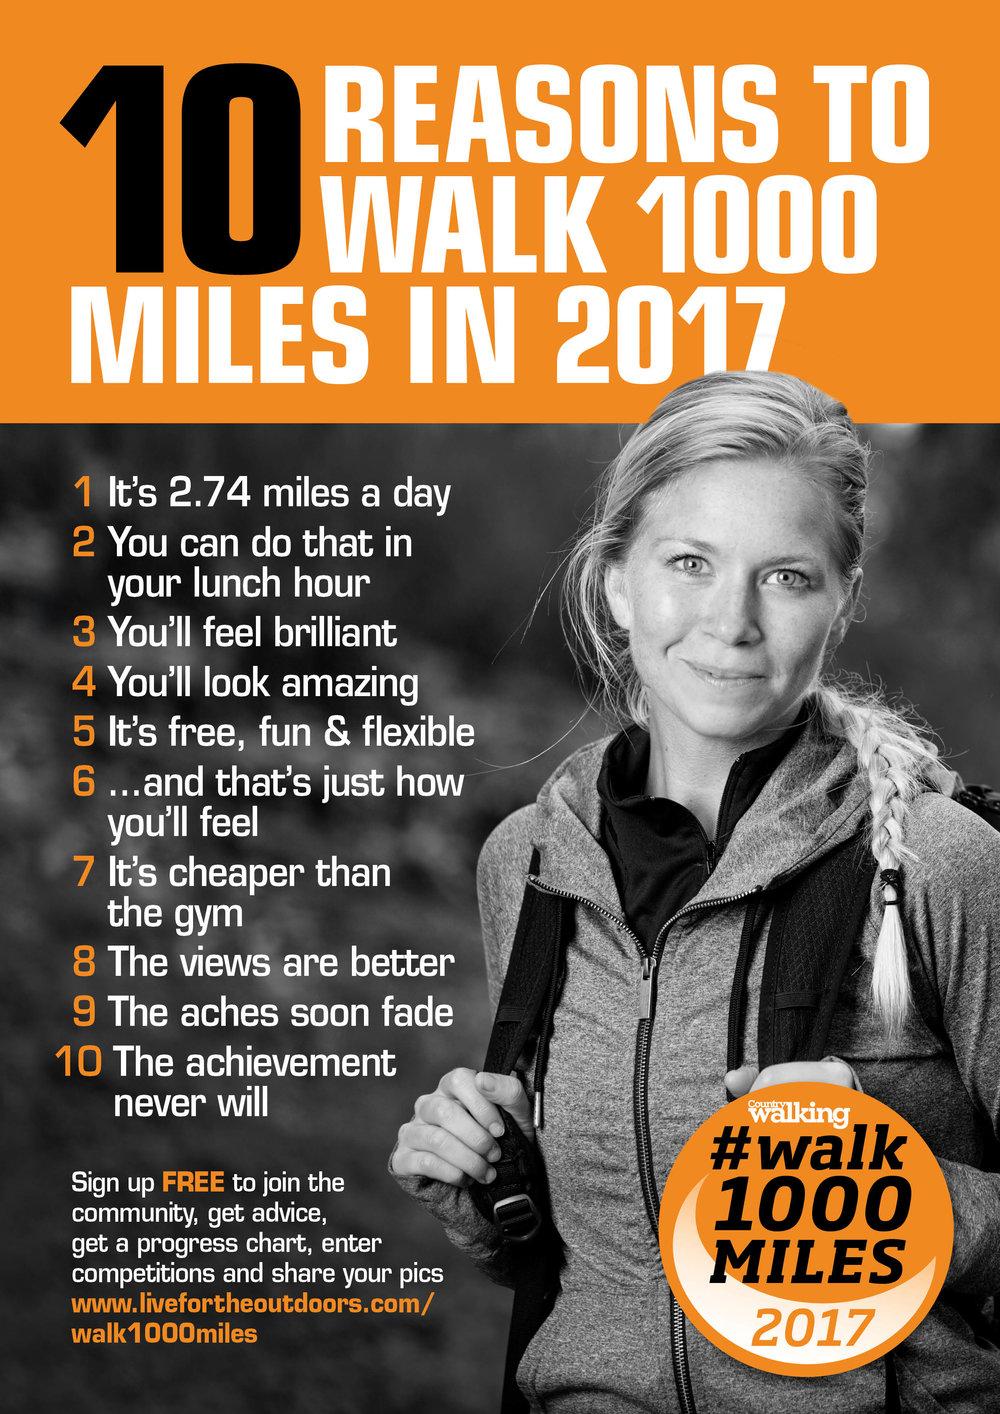 #walk1000miles 2017 poster5.jpg